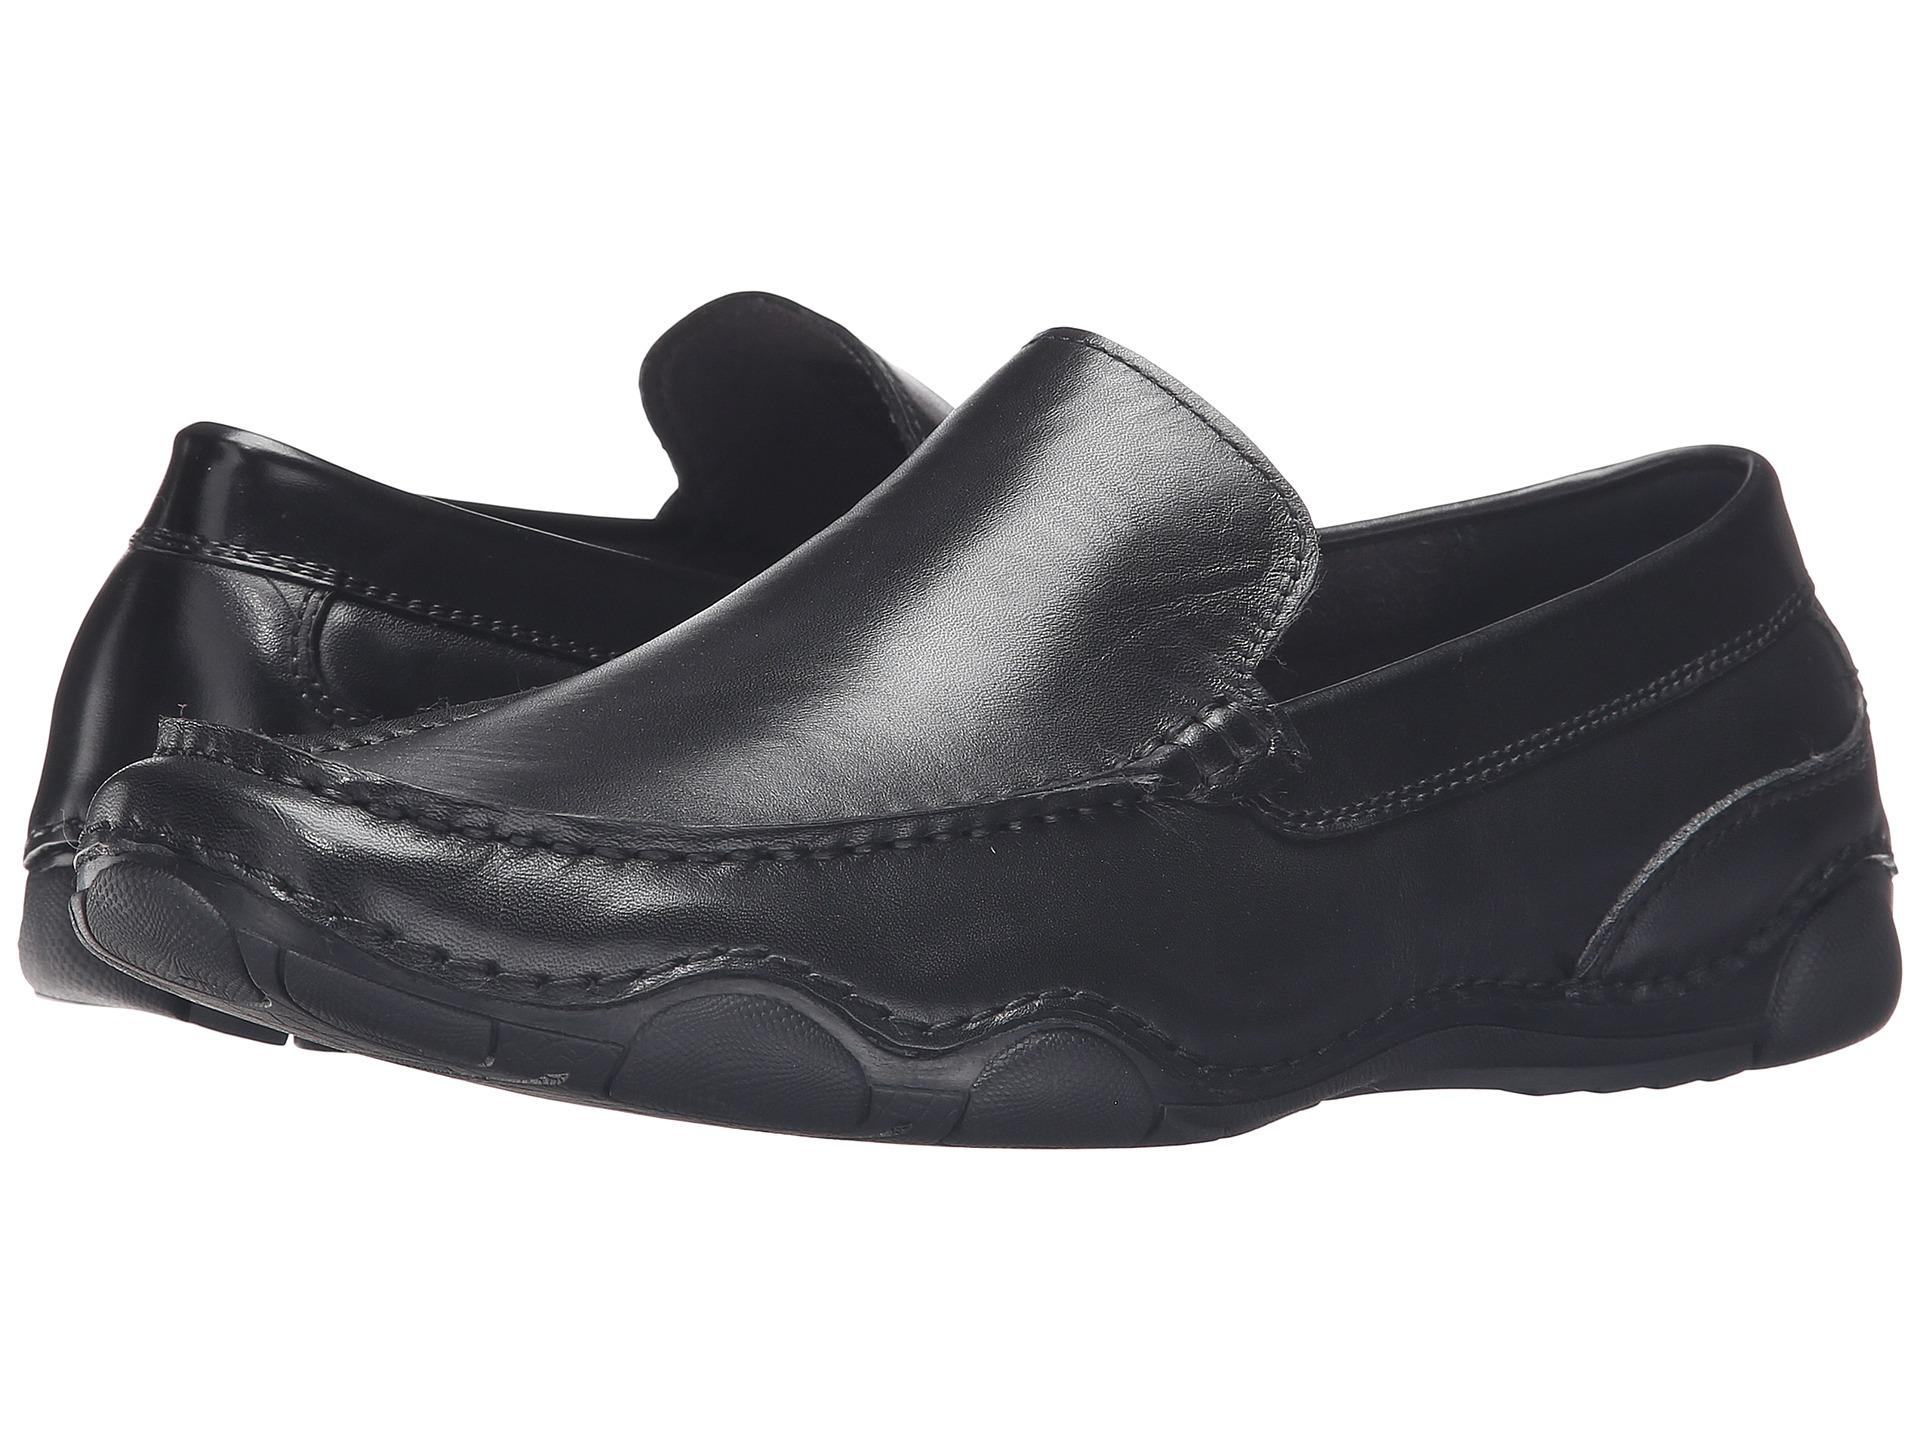 Next Mens Boots Images And Ralph Lauren Winter